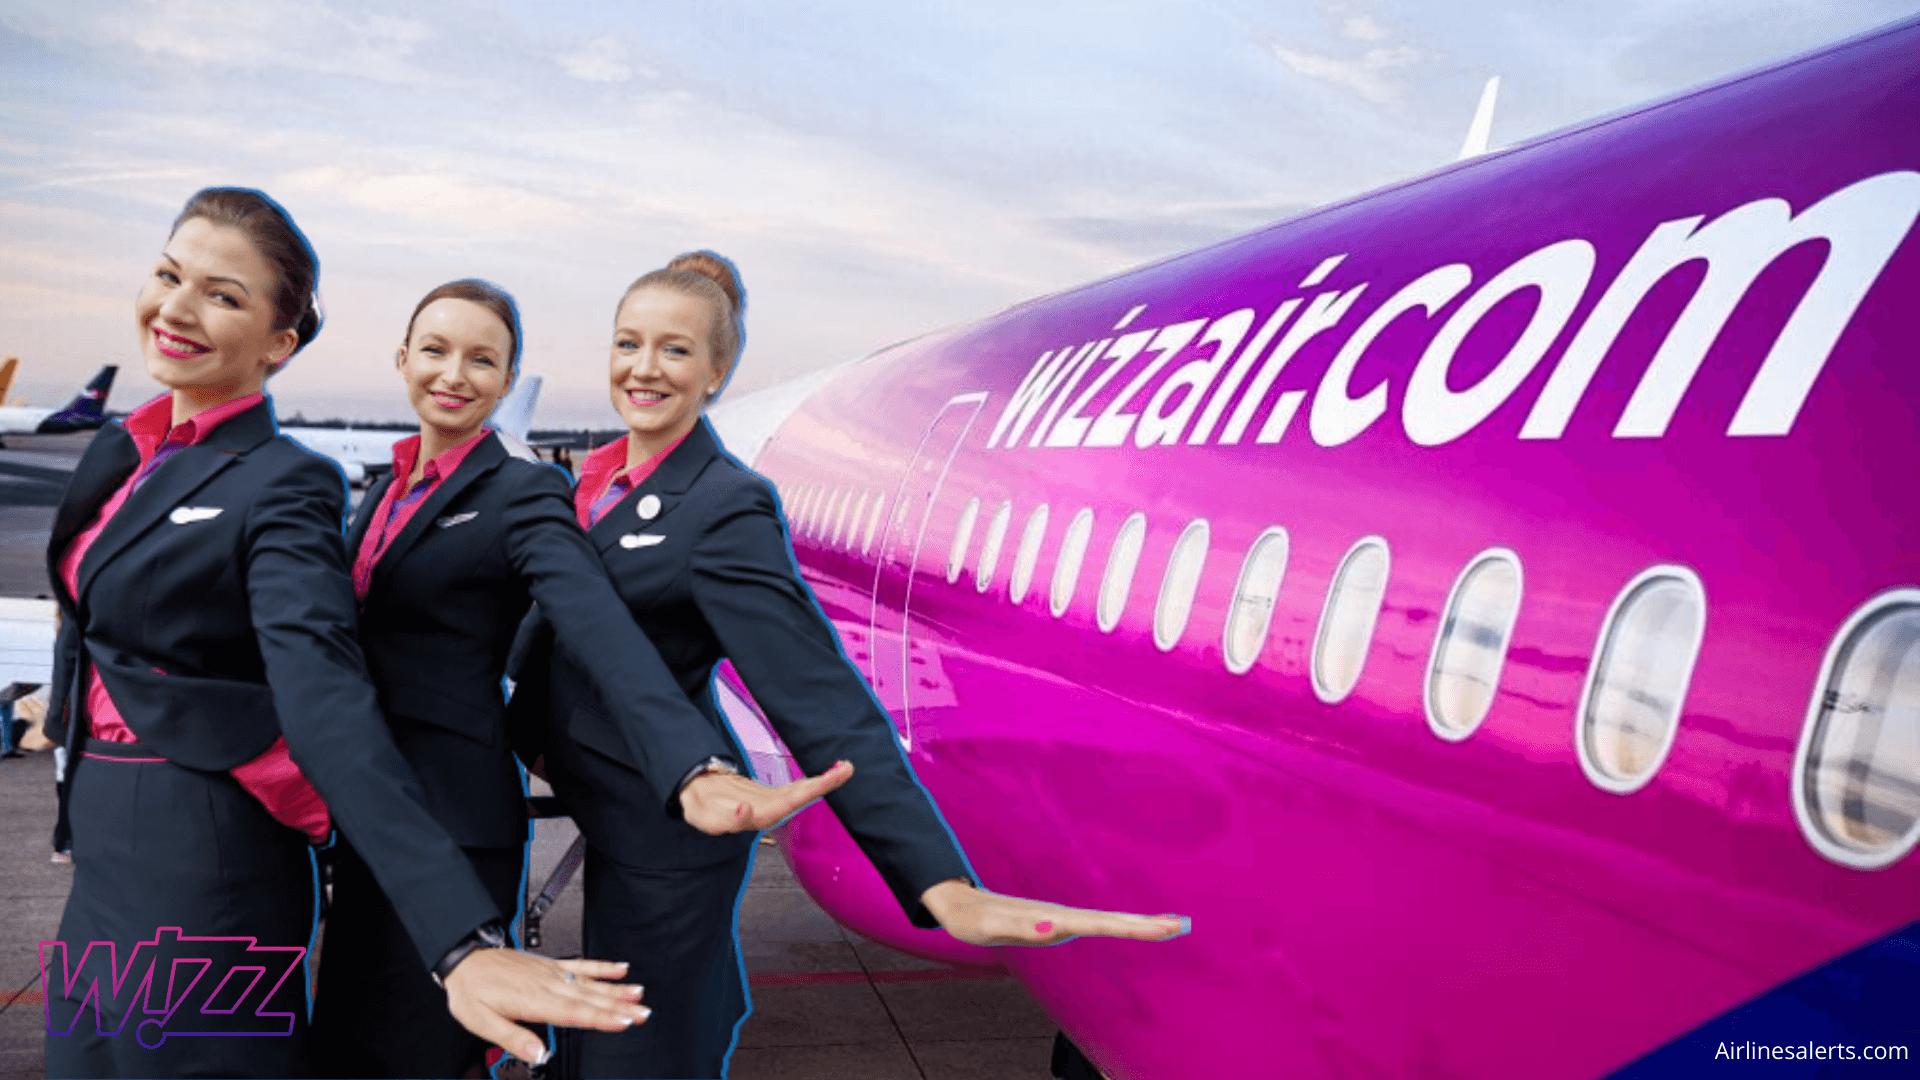 Wizz Air Cabin Crew Hiring (July 2020) - Apply Online - St. Petersburg